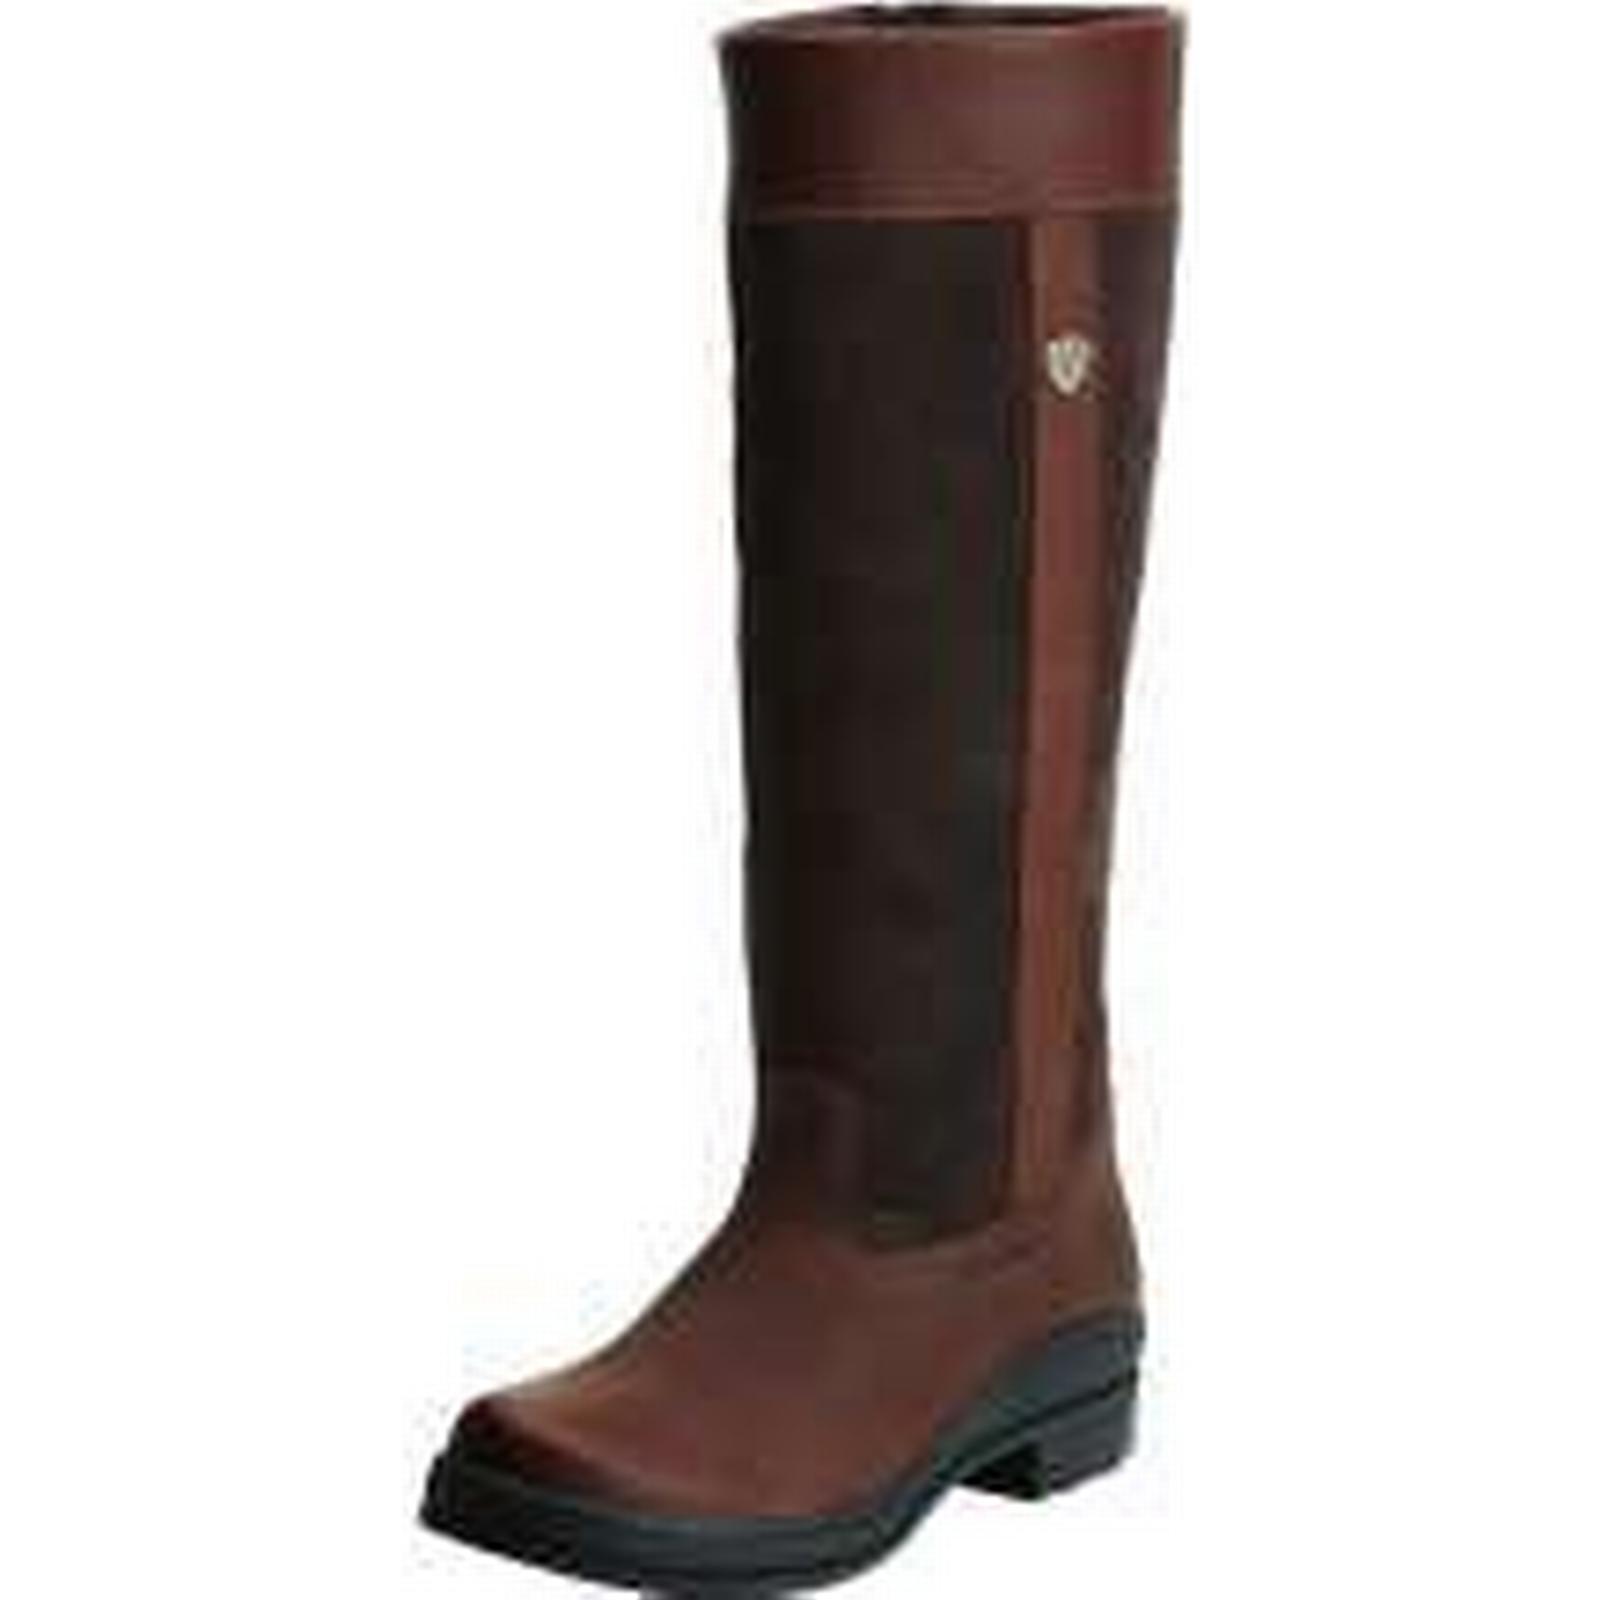 Ariat Windermere H2O Boots, Full Dark Brown, UK 7.5 Full Boots, Calf bcf99a